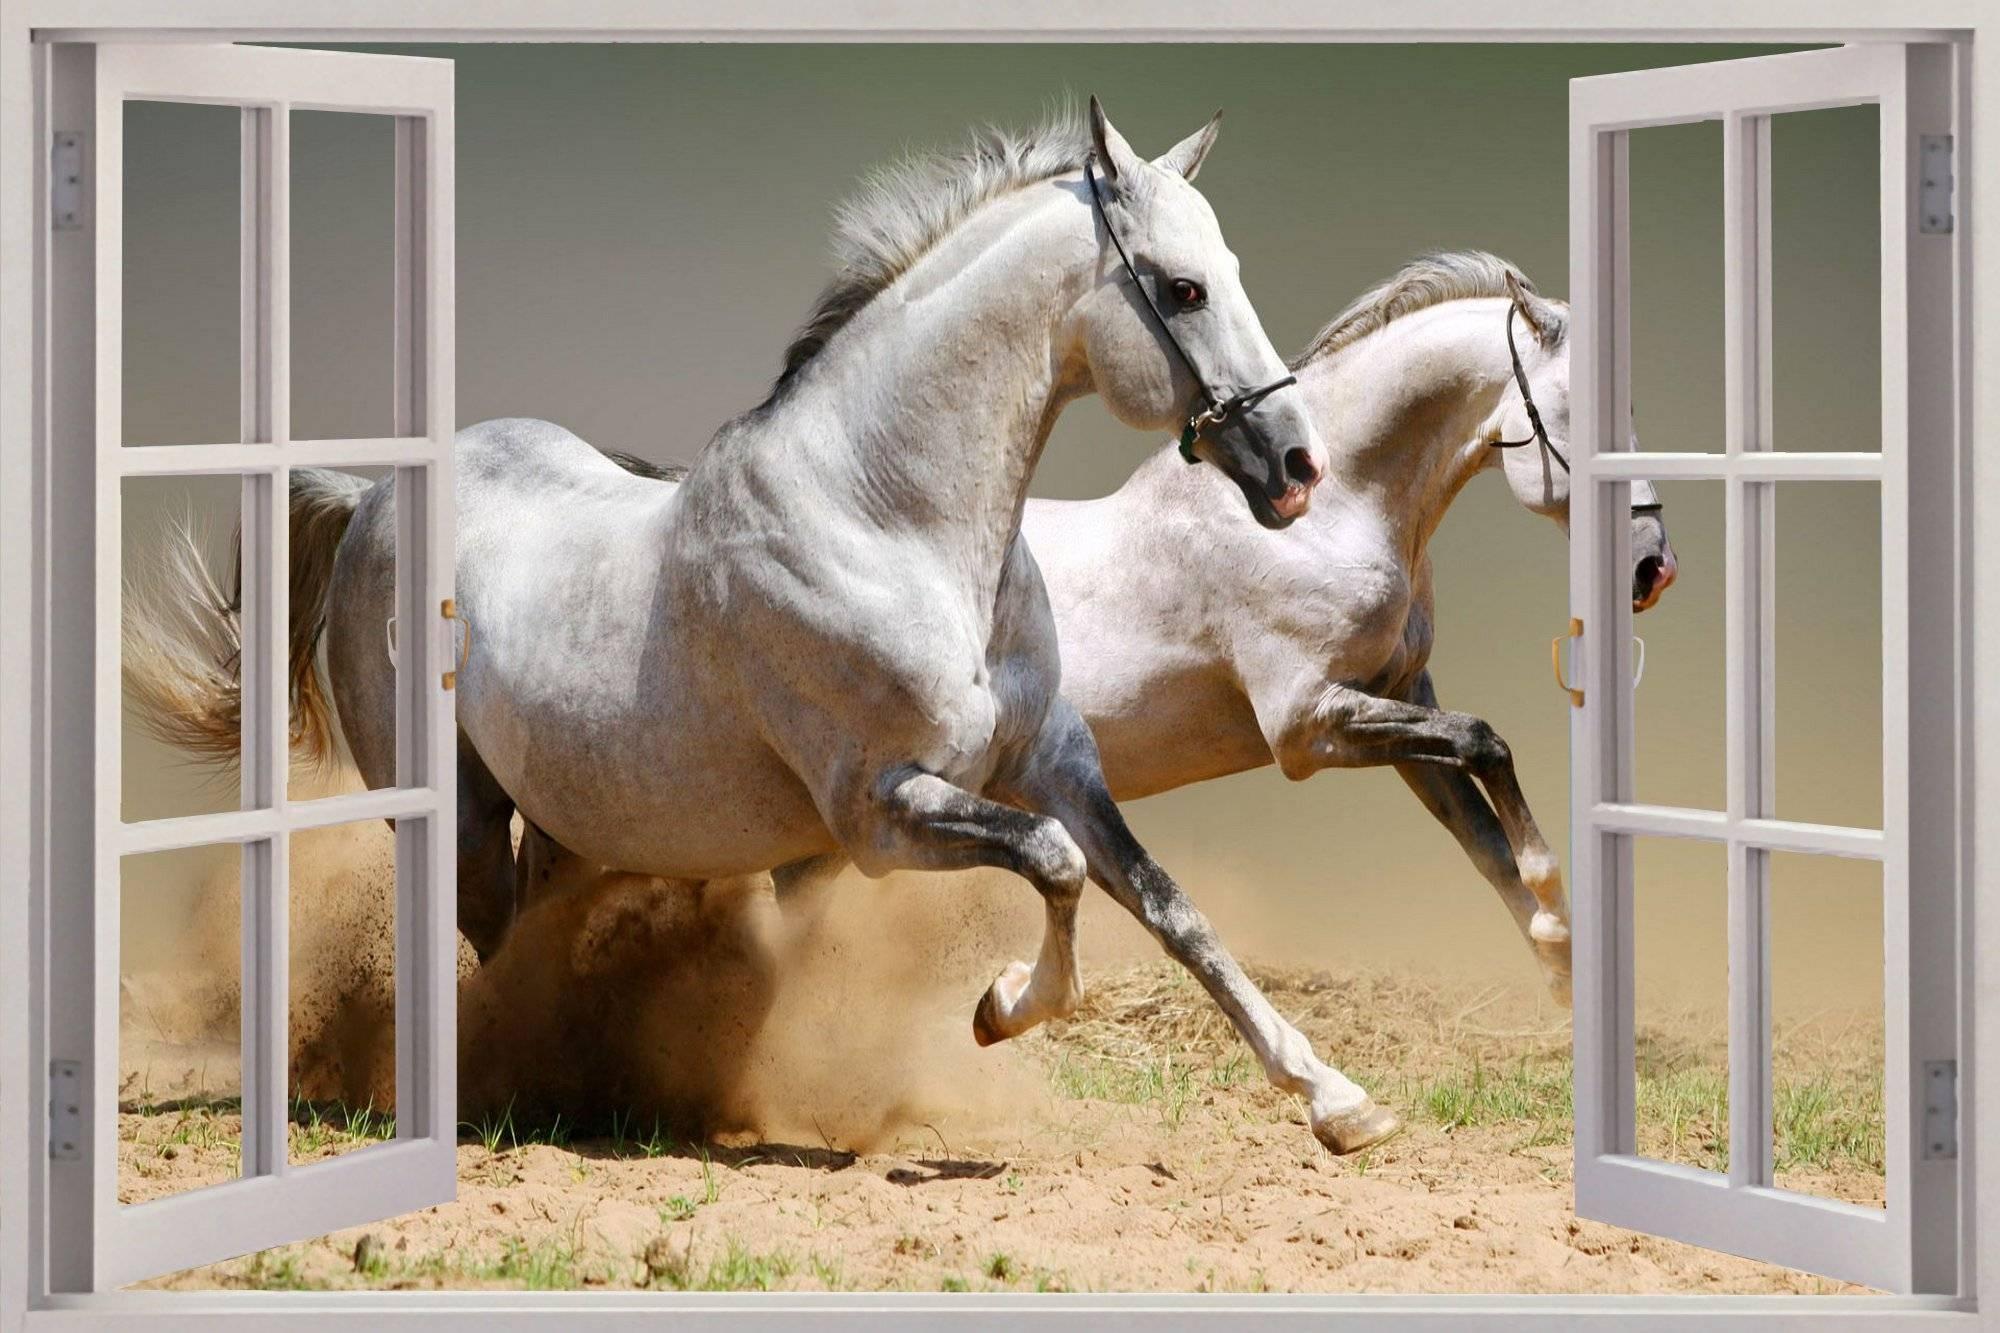 3d Horse Wall Art | Wallartideas With Regard To Most Current 3d Horse Wall Art (View 2 of 20)